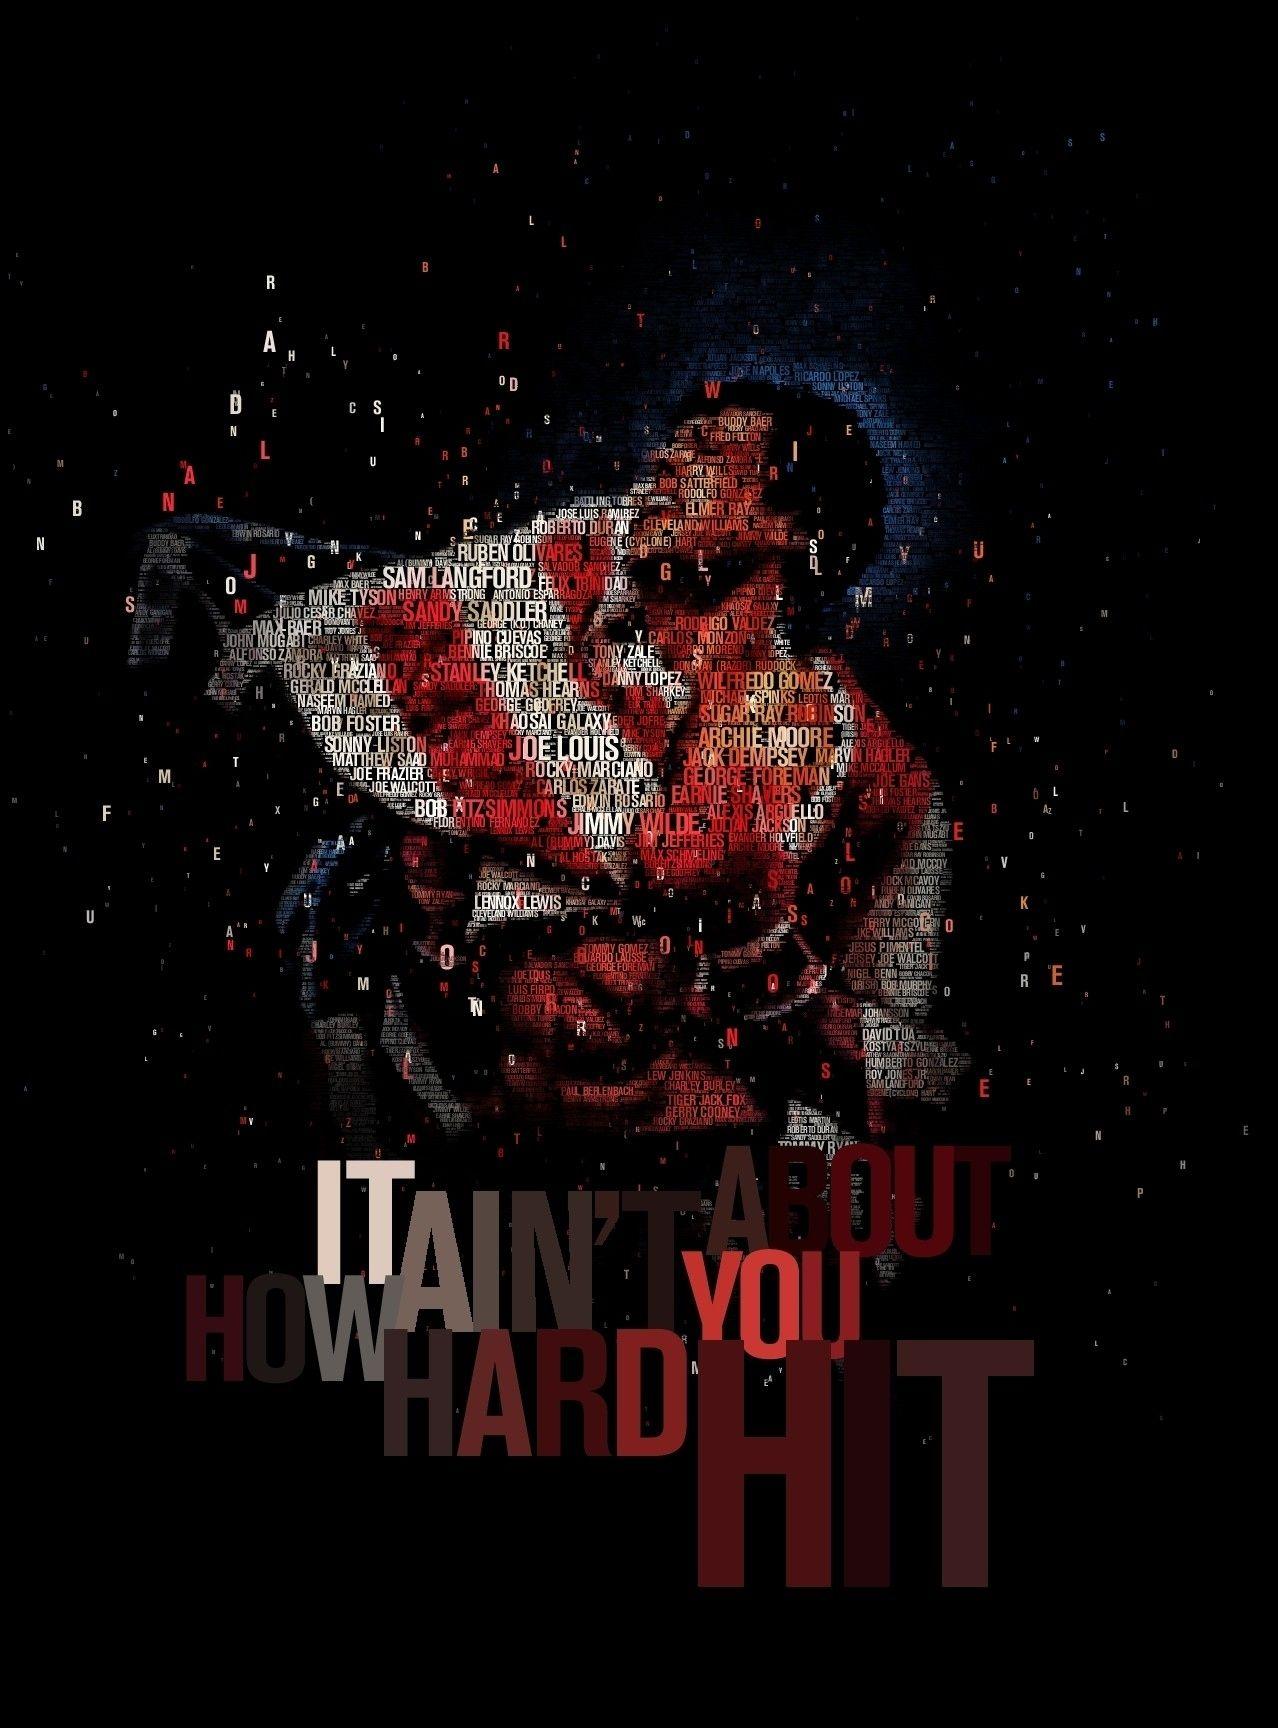 Muhammad Ali Quote Iphone Wallpaper Rocky Quotes Iphone Wallpaper Download New Rocky Quotes